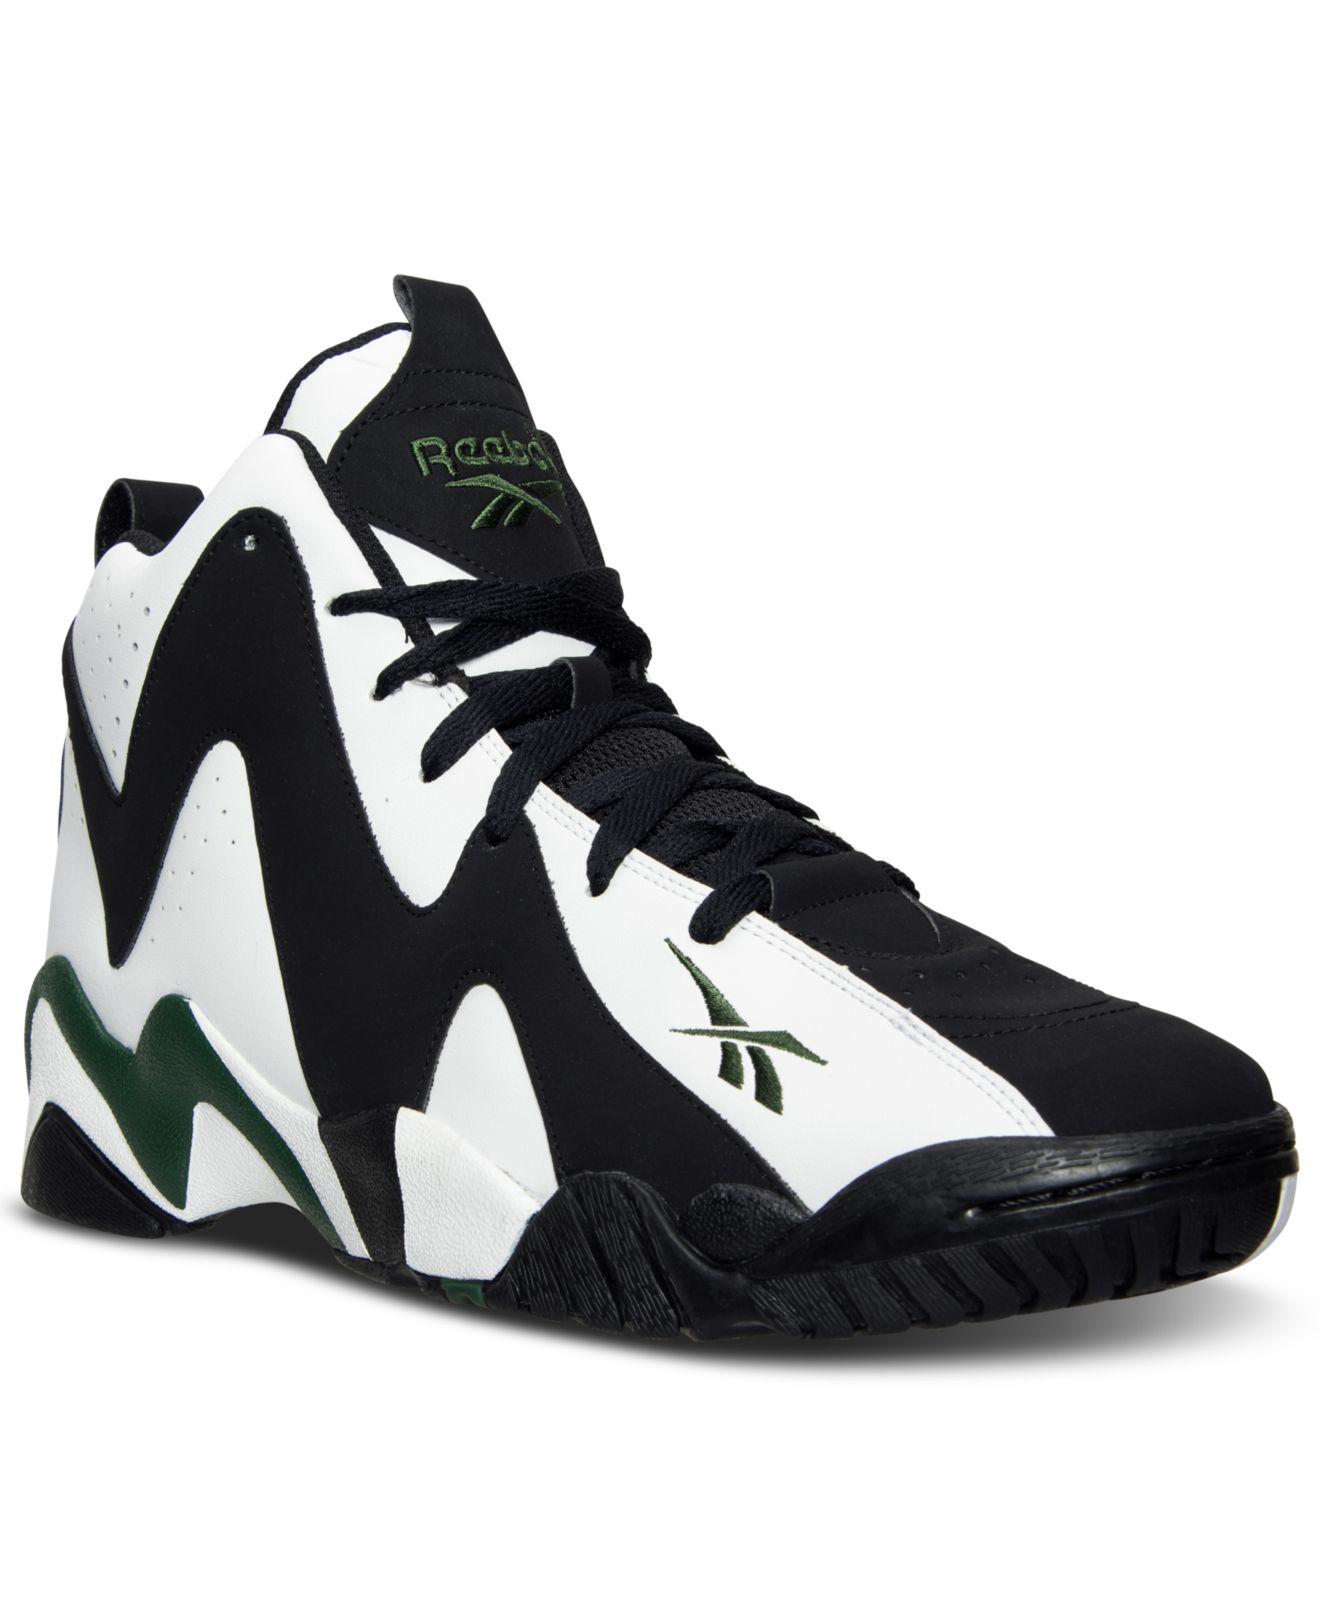 Old School Reebok Basketball Shoes